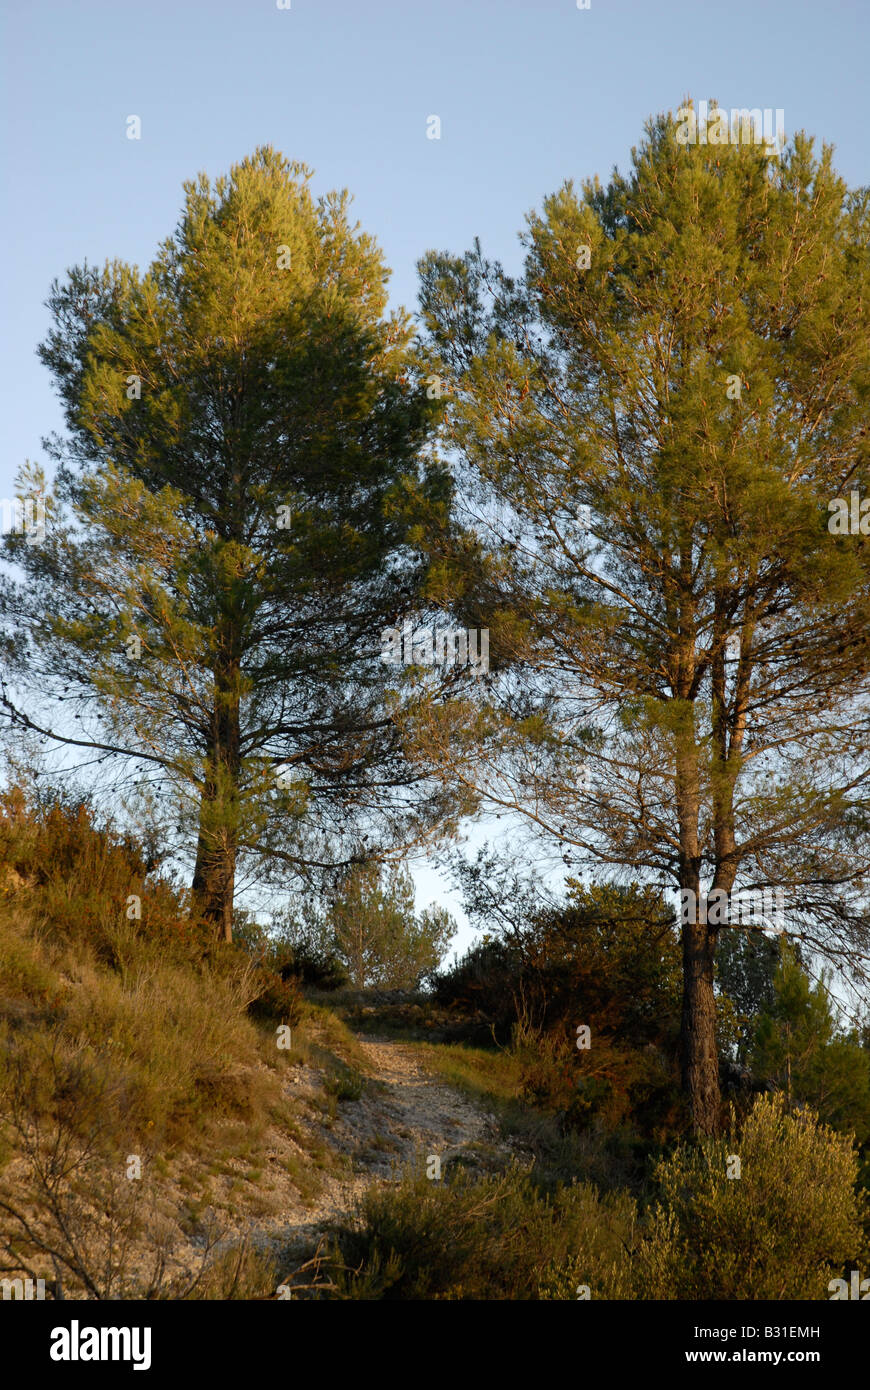 path down to Els Tolls, near Vall de Ebo village, Marina Alta, Alicante Prov. Comunidad Valenciana, Spain - Stock Image